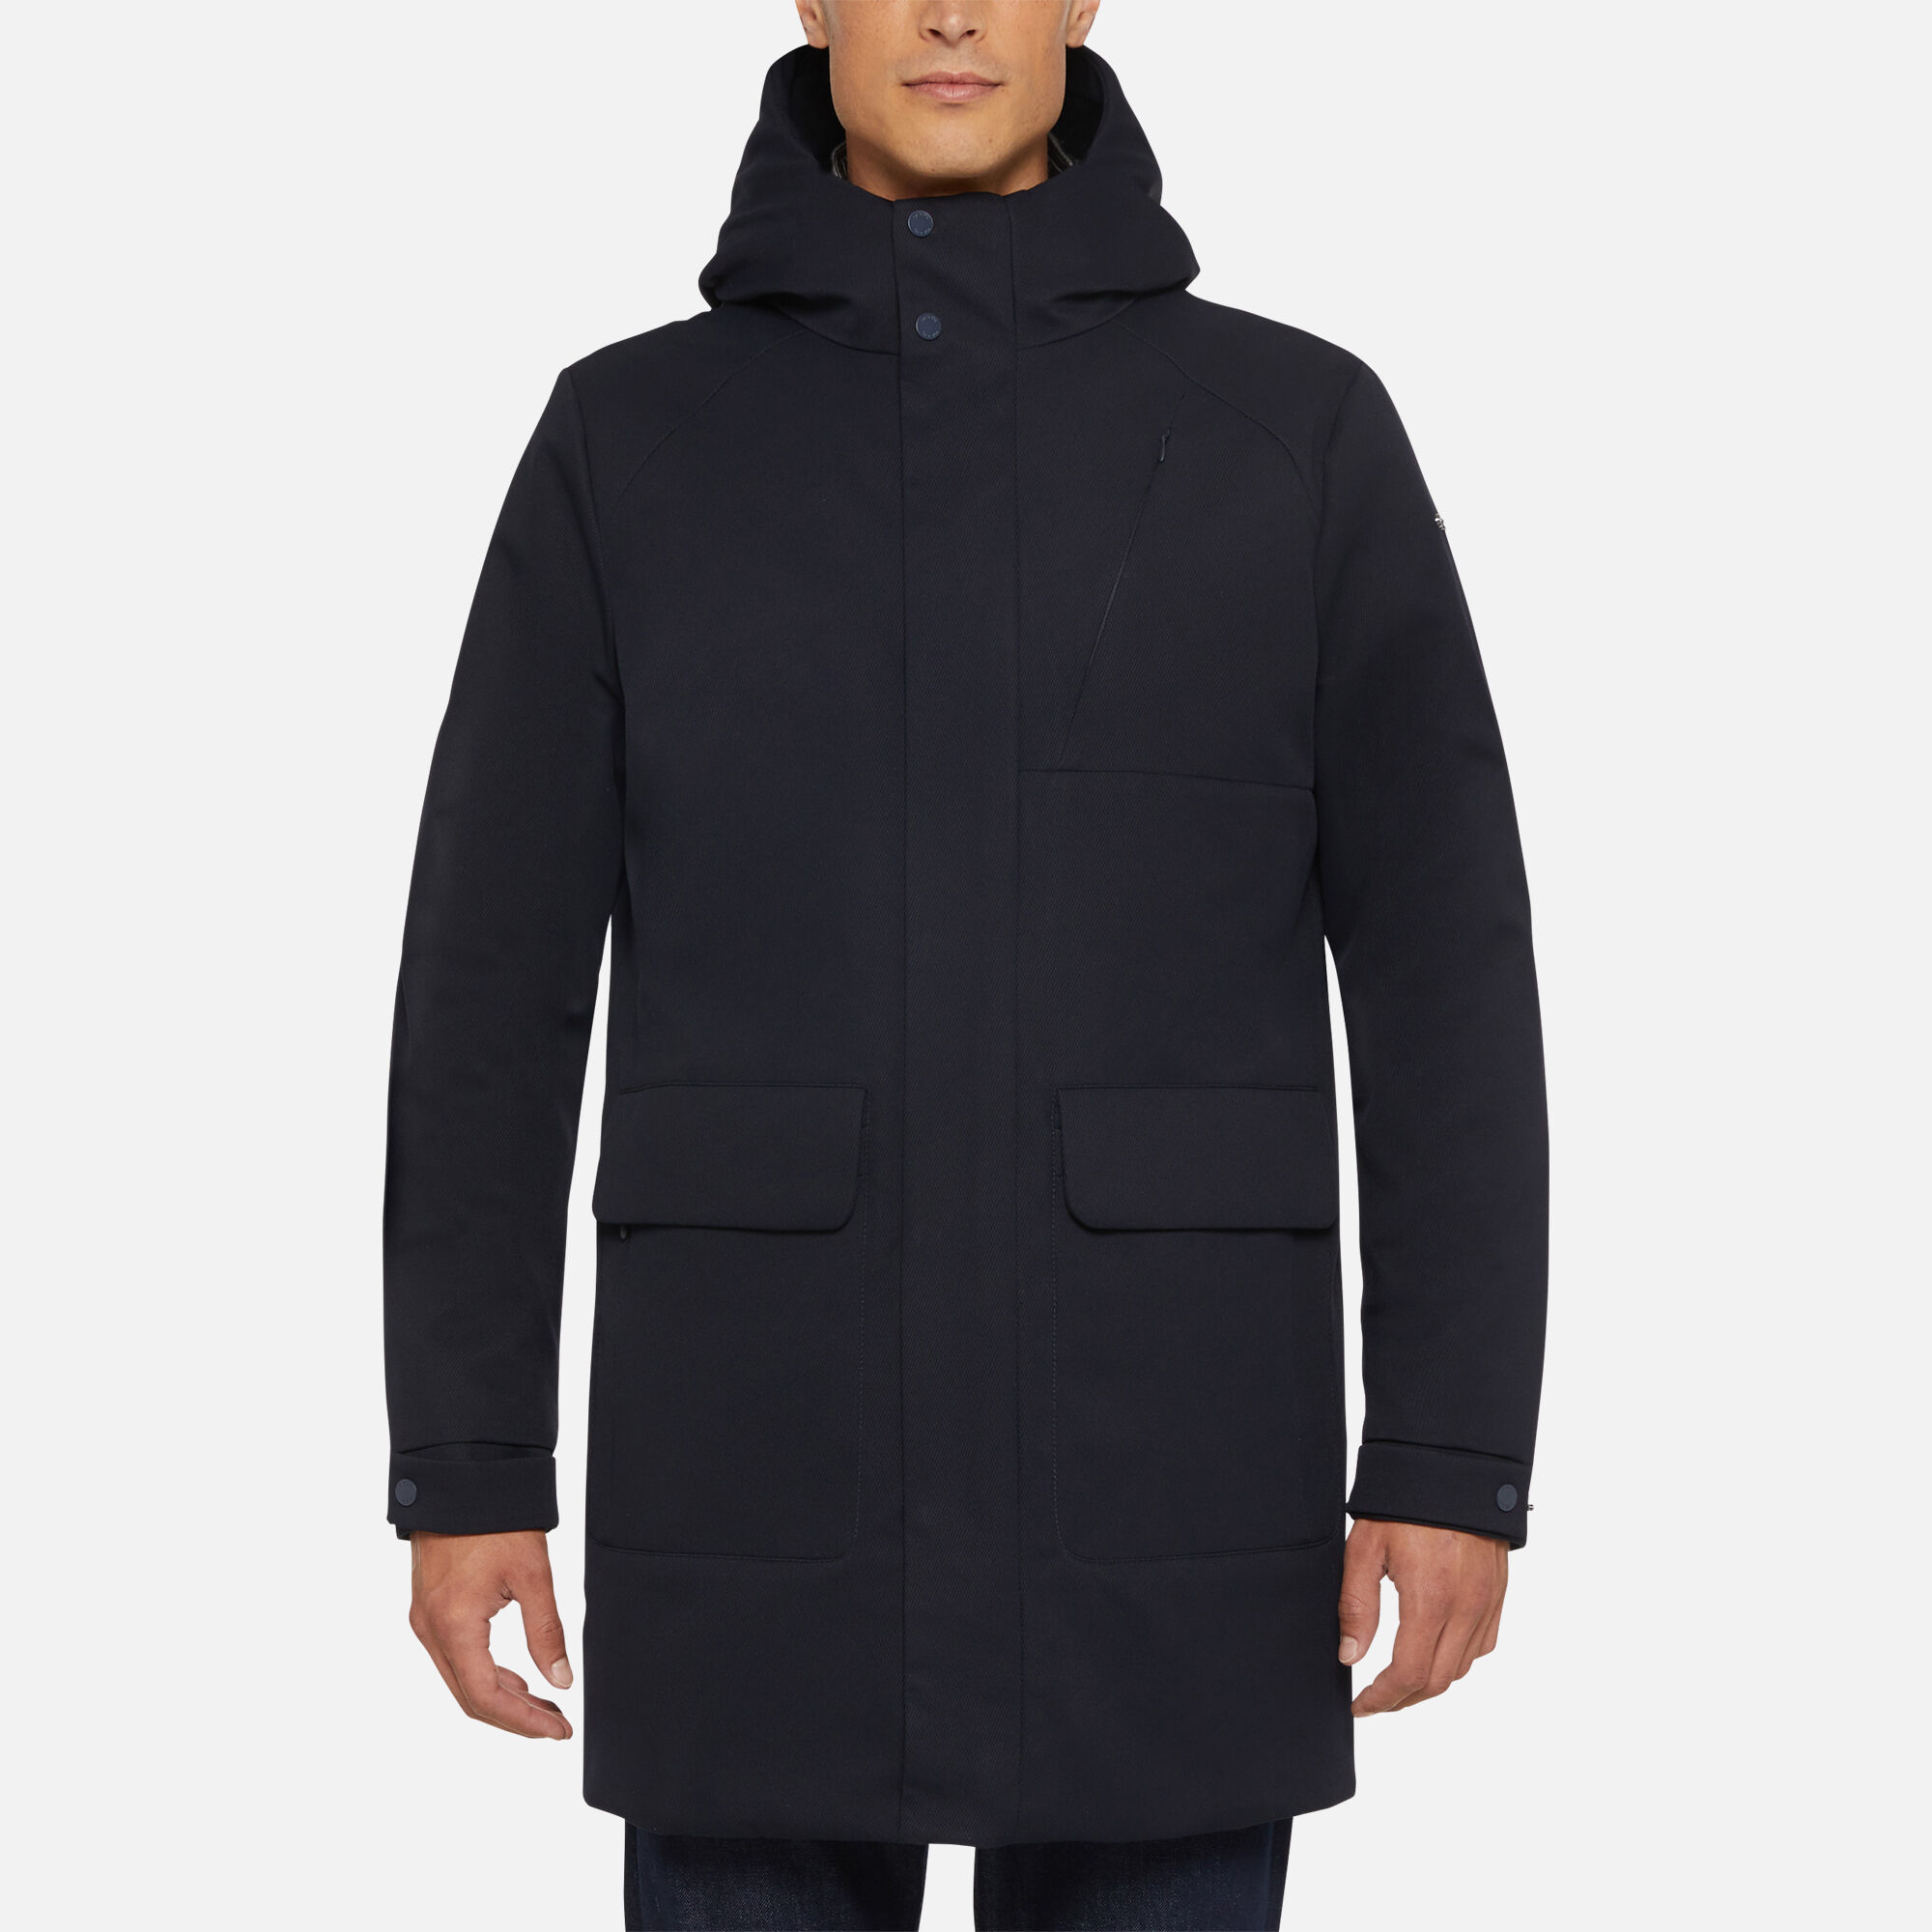 Geox AERANTIS Mann: blaue Jacke | Geox FW1920